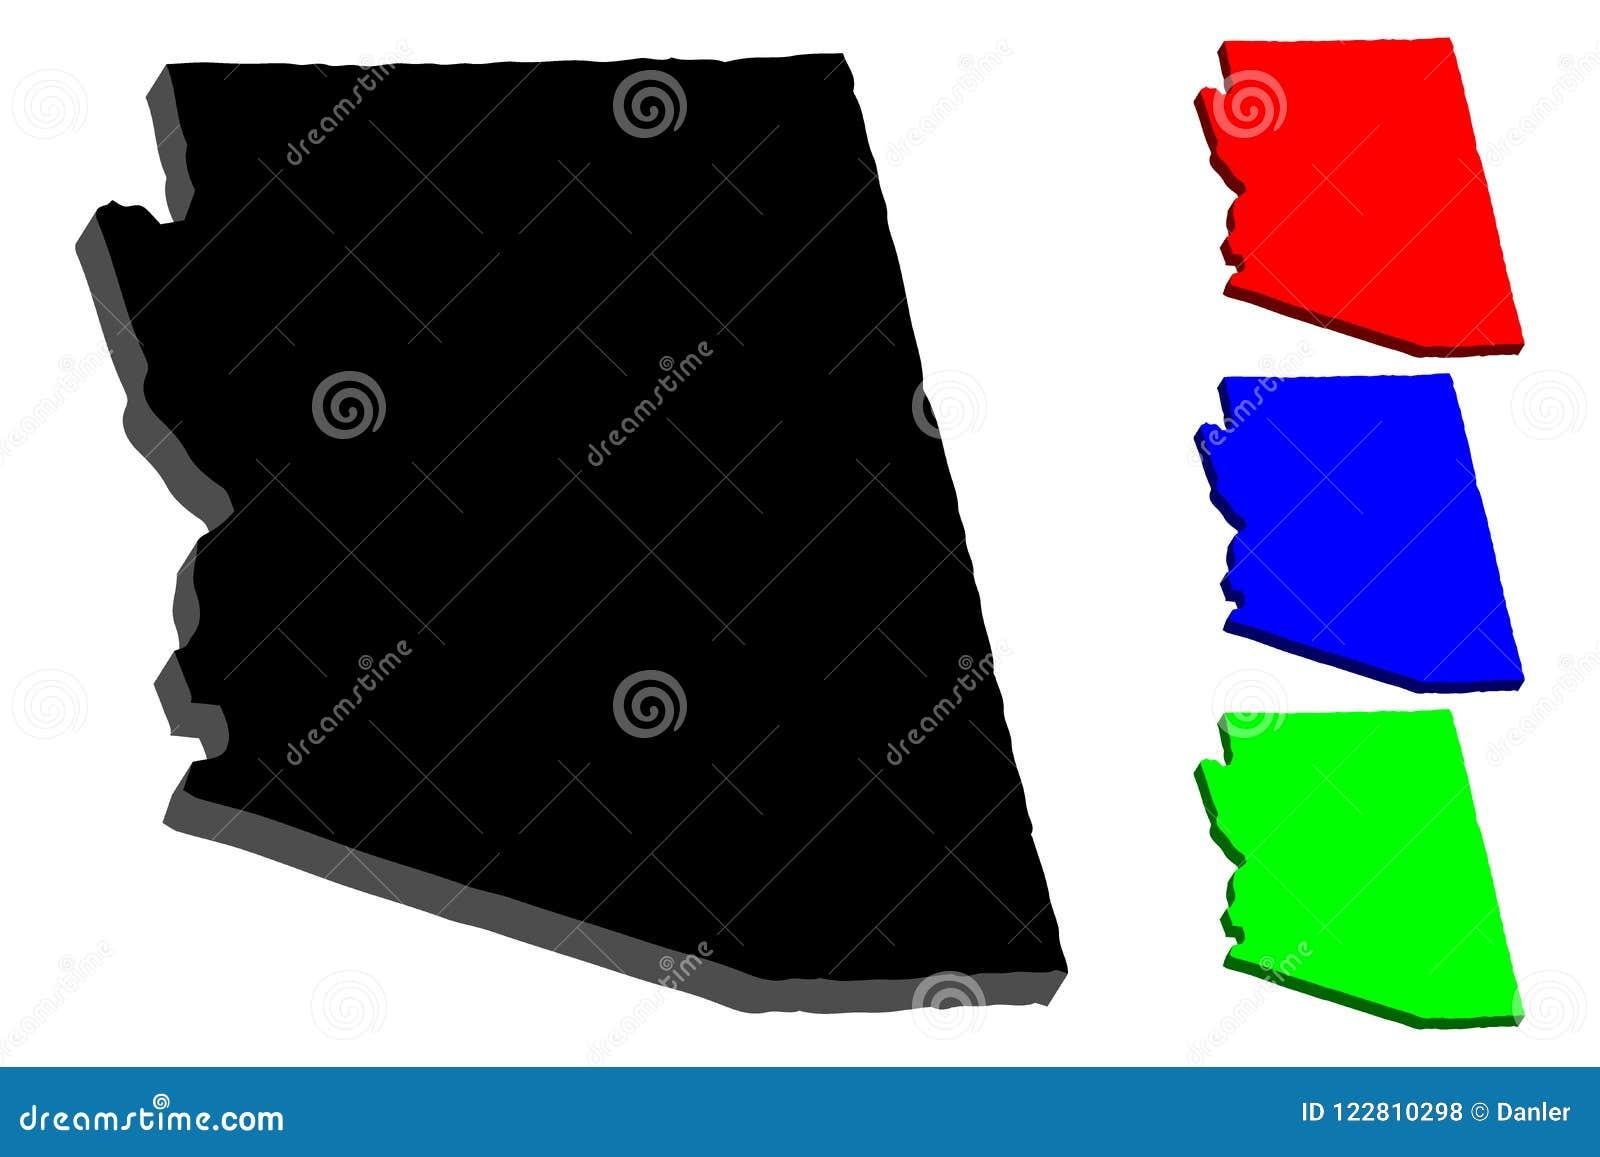 3d Map Of Arizona.3d Map Of Arizona Stock Vector Illustration Of Patriotism 122810298